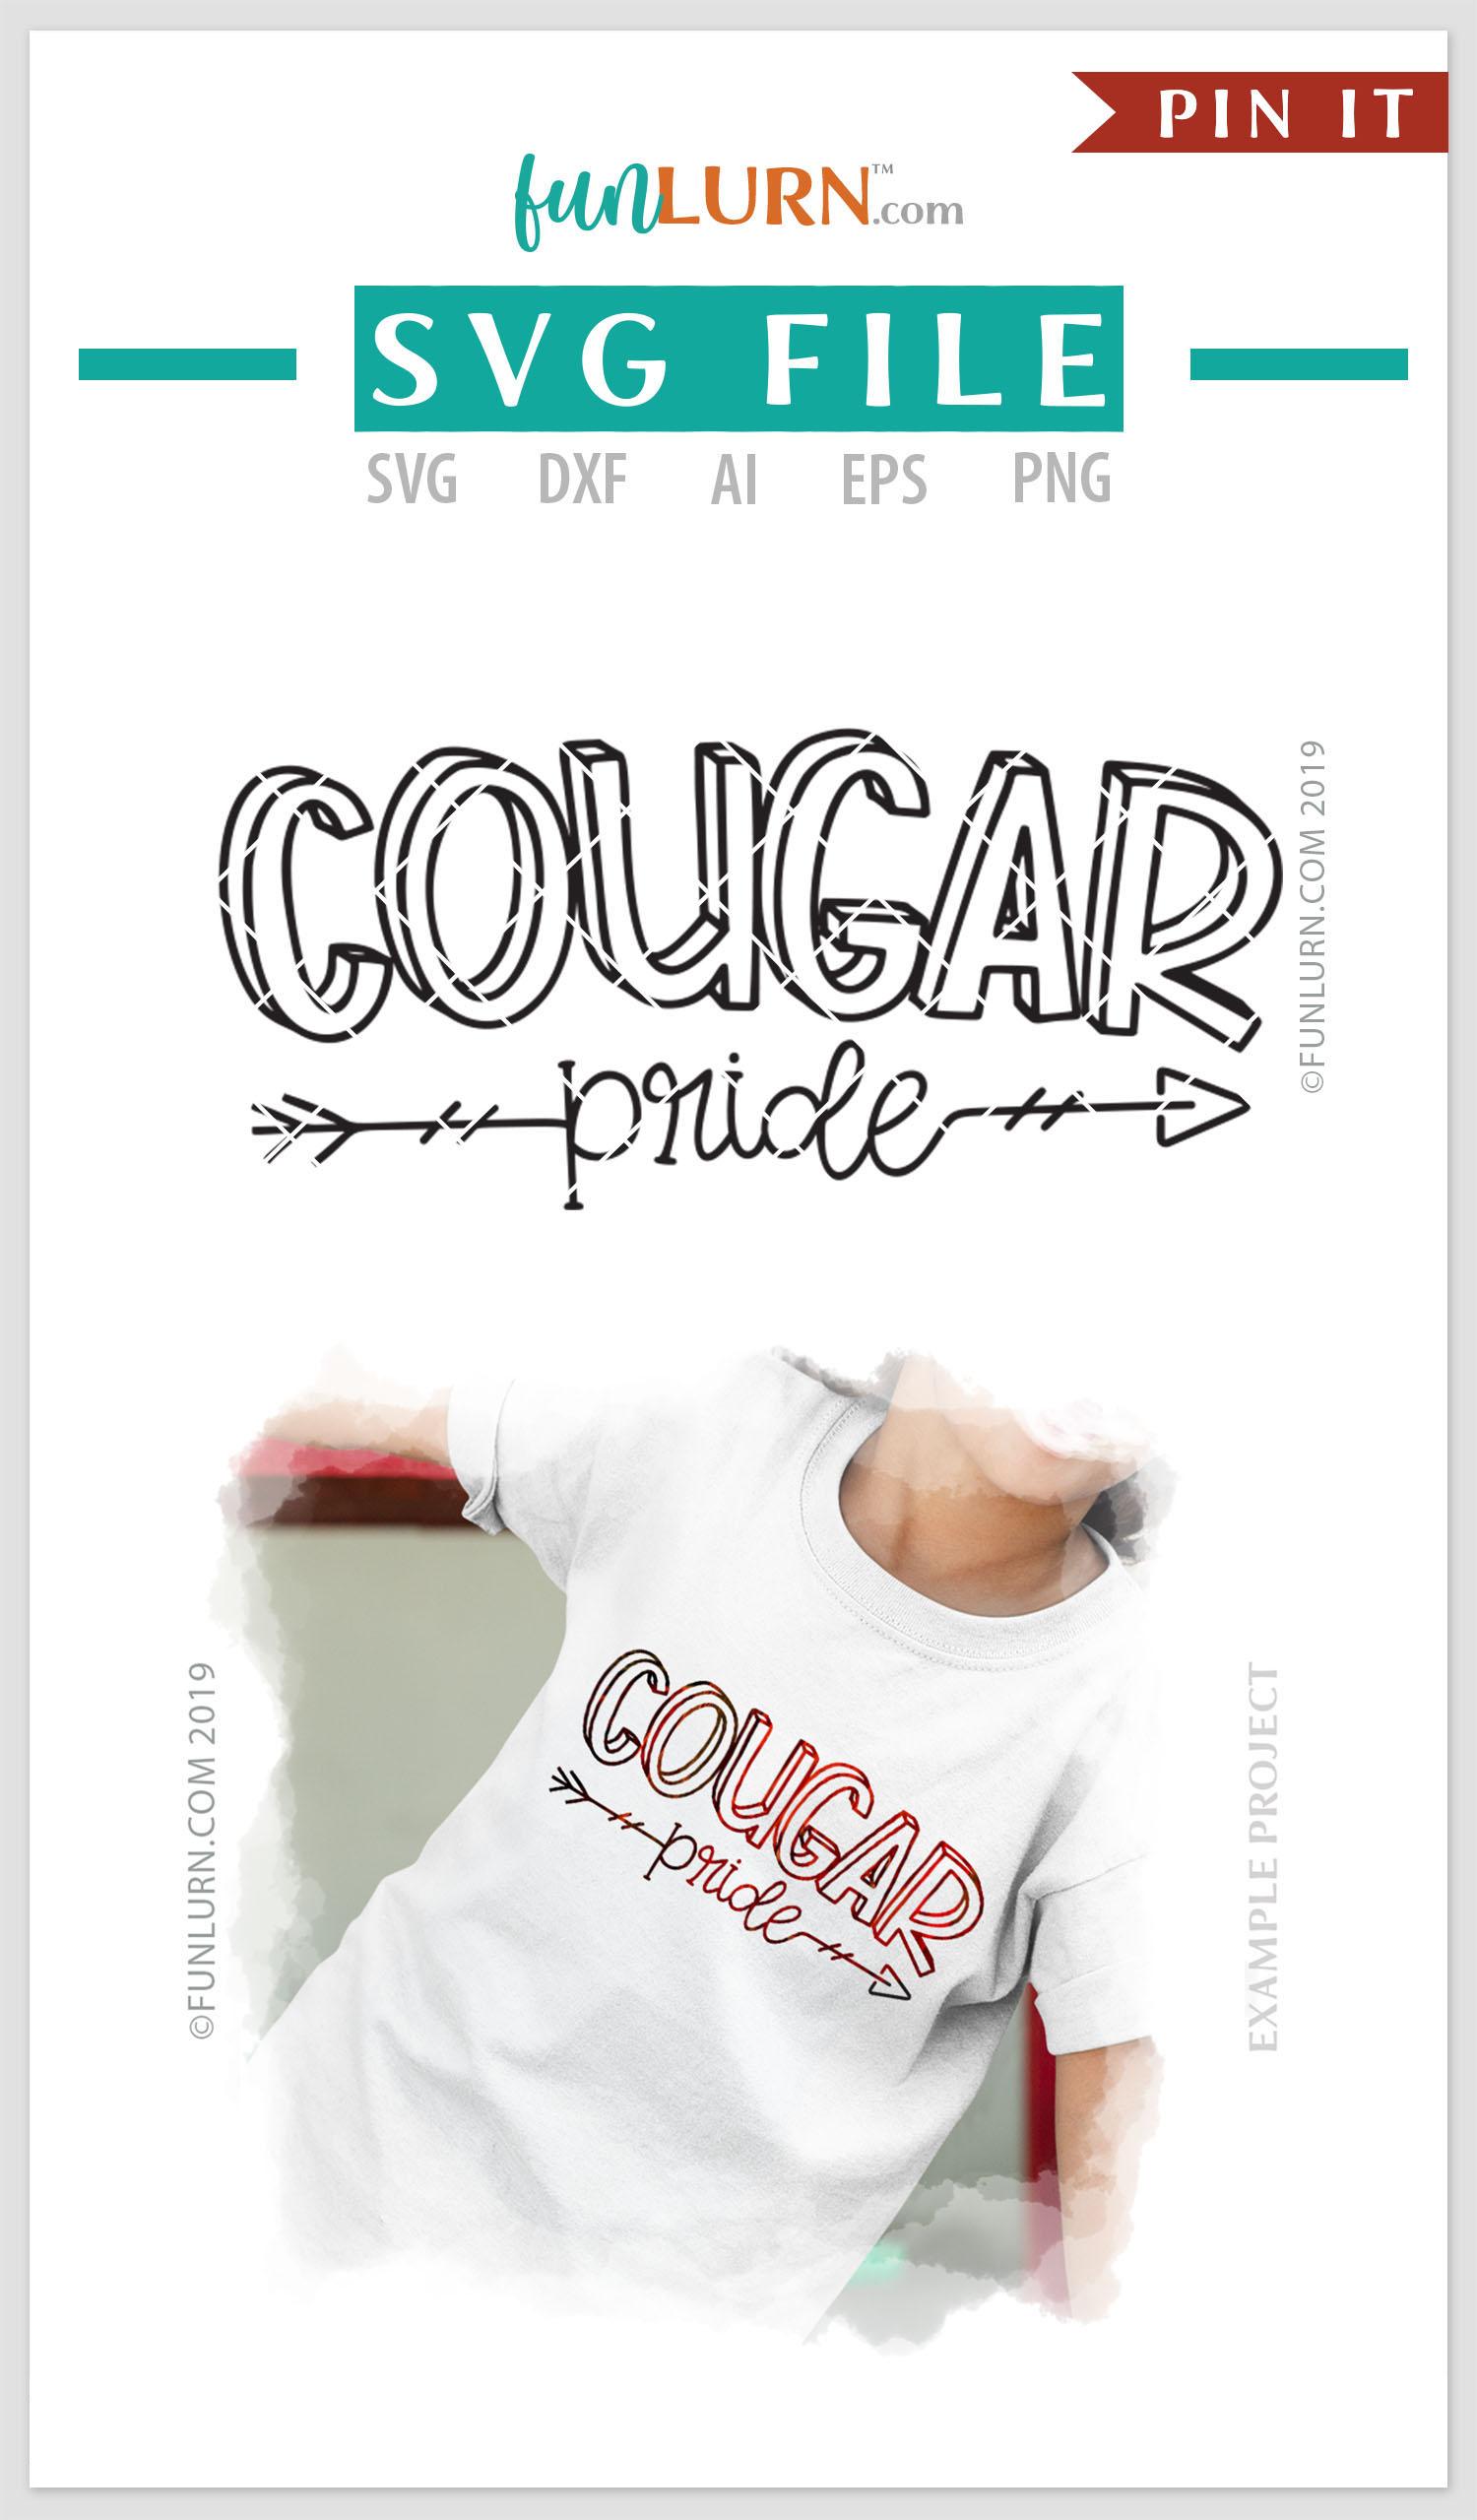 Cougar Pride Team SVG Cut File example image 4